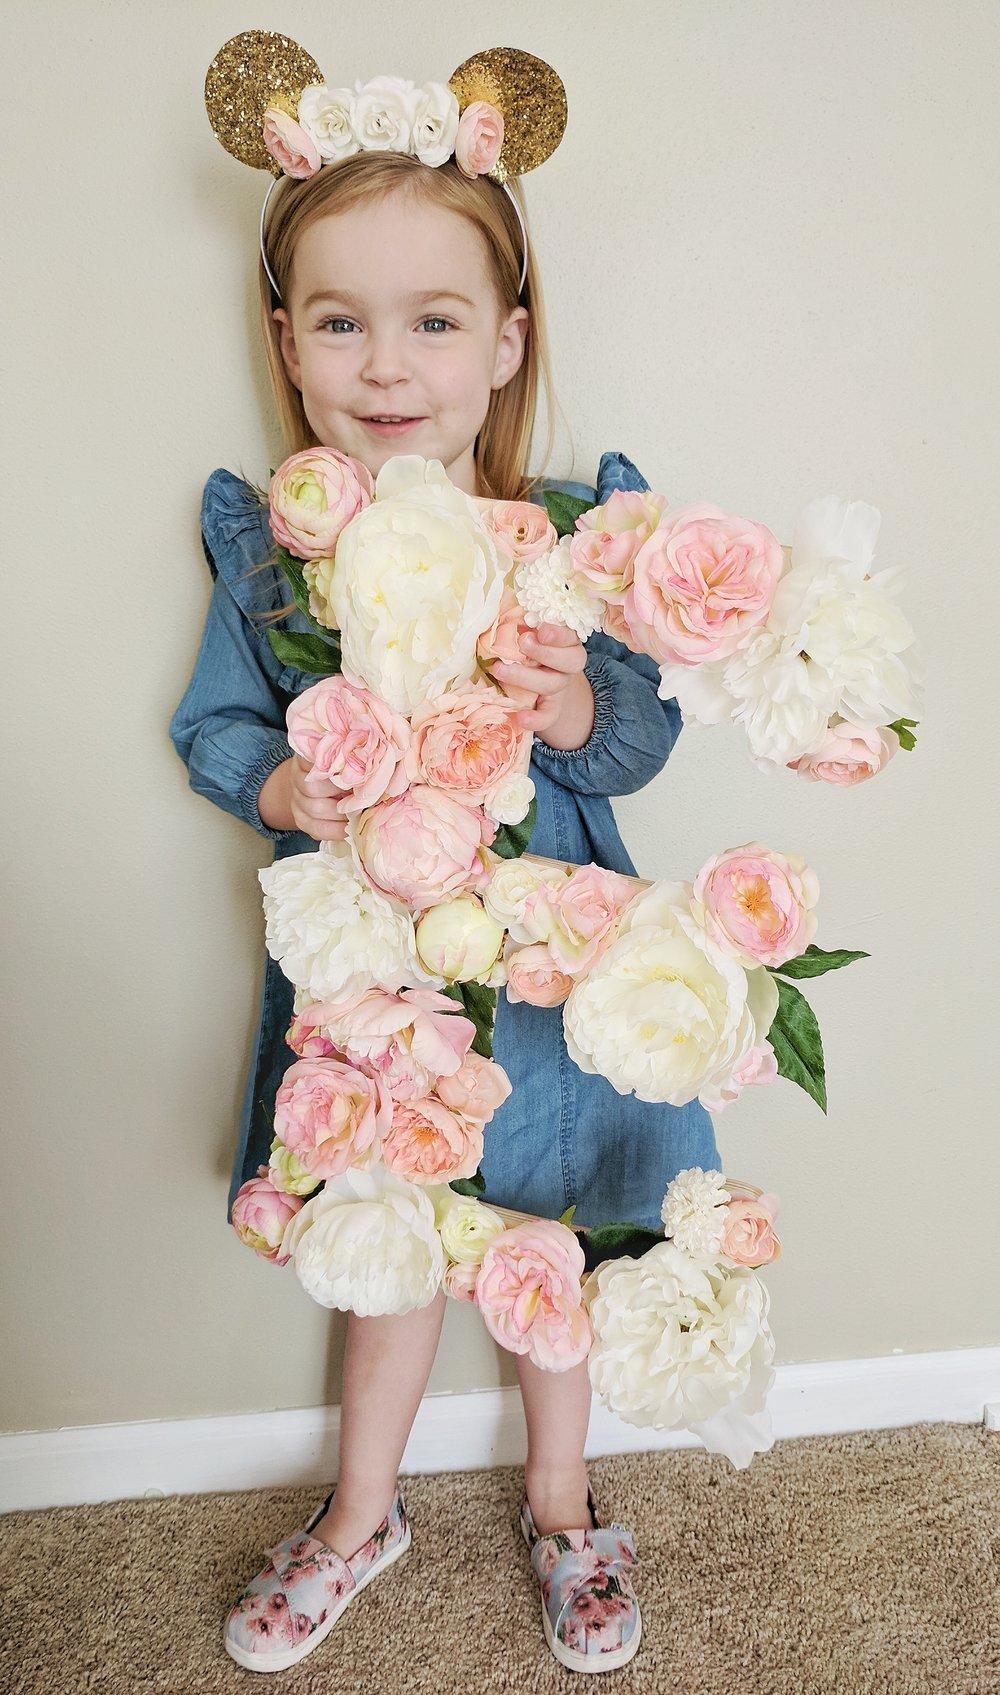 Floral Minnie Headband  /  Floral E  / Shoes: TOMS / Denim dress: Old Navy